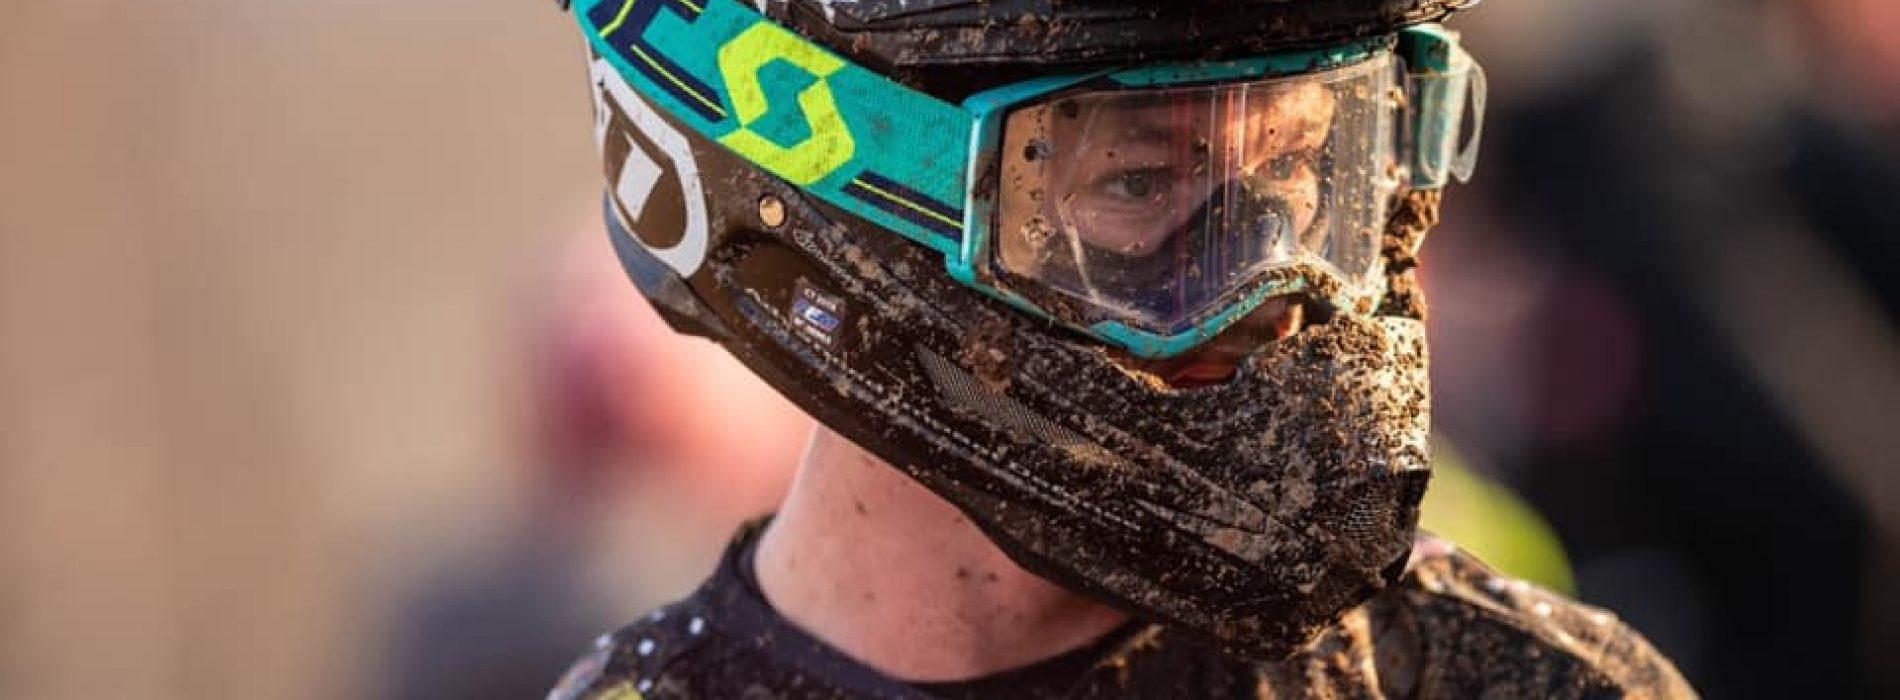 Dylan Walsh hits FIM World MX Championship MX2 Round One